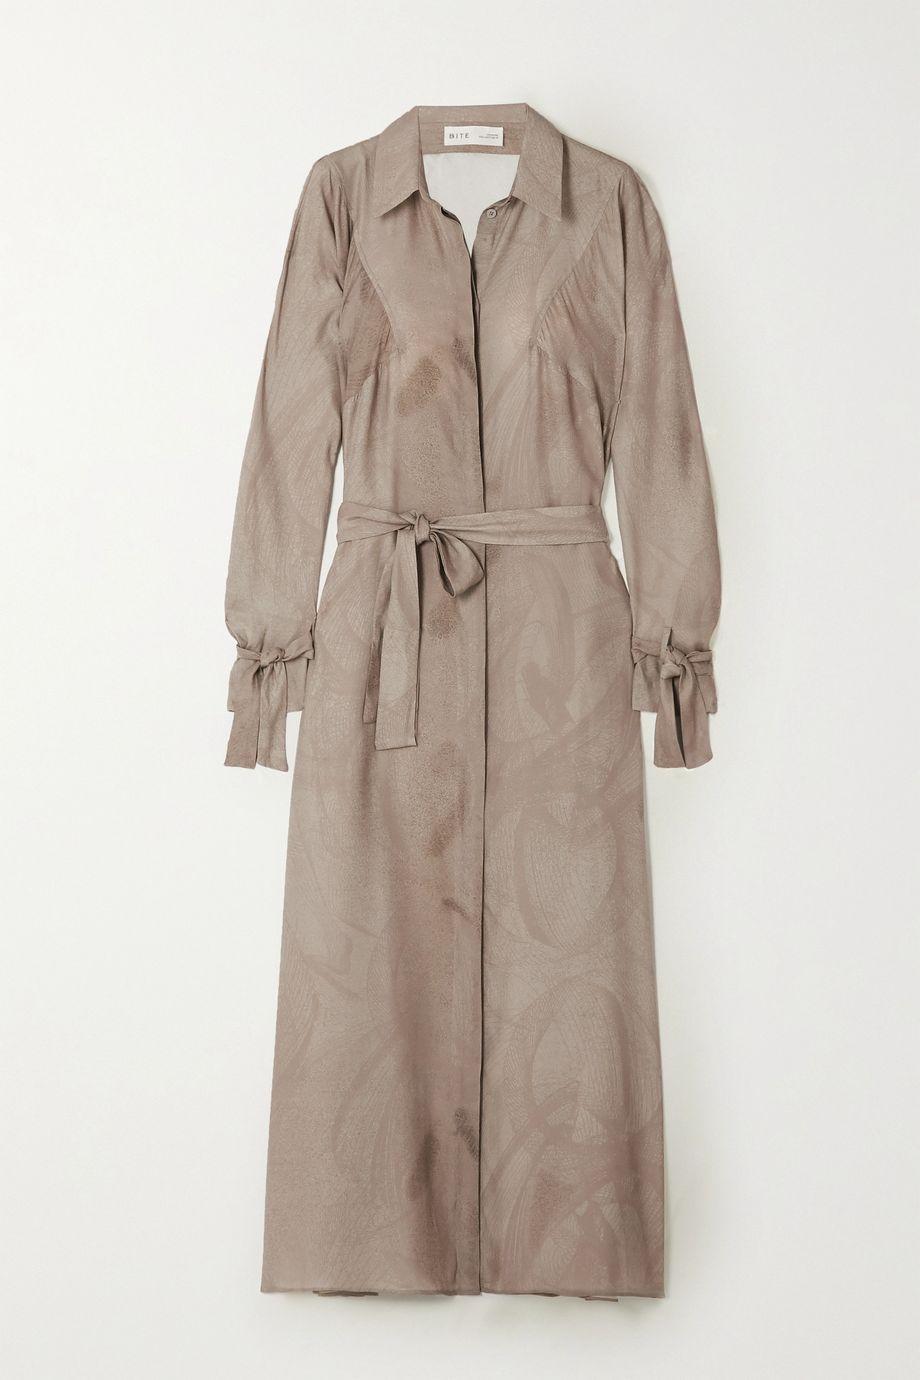 BITE Studios + NET SUSTAIN printed organic silk midi dress